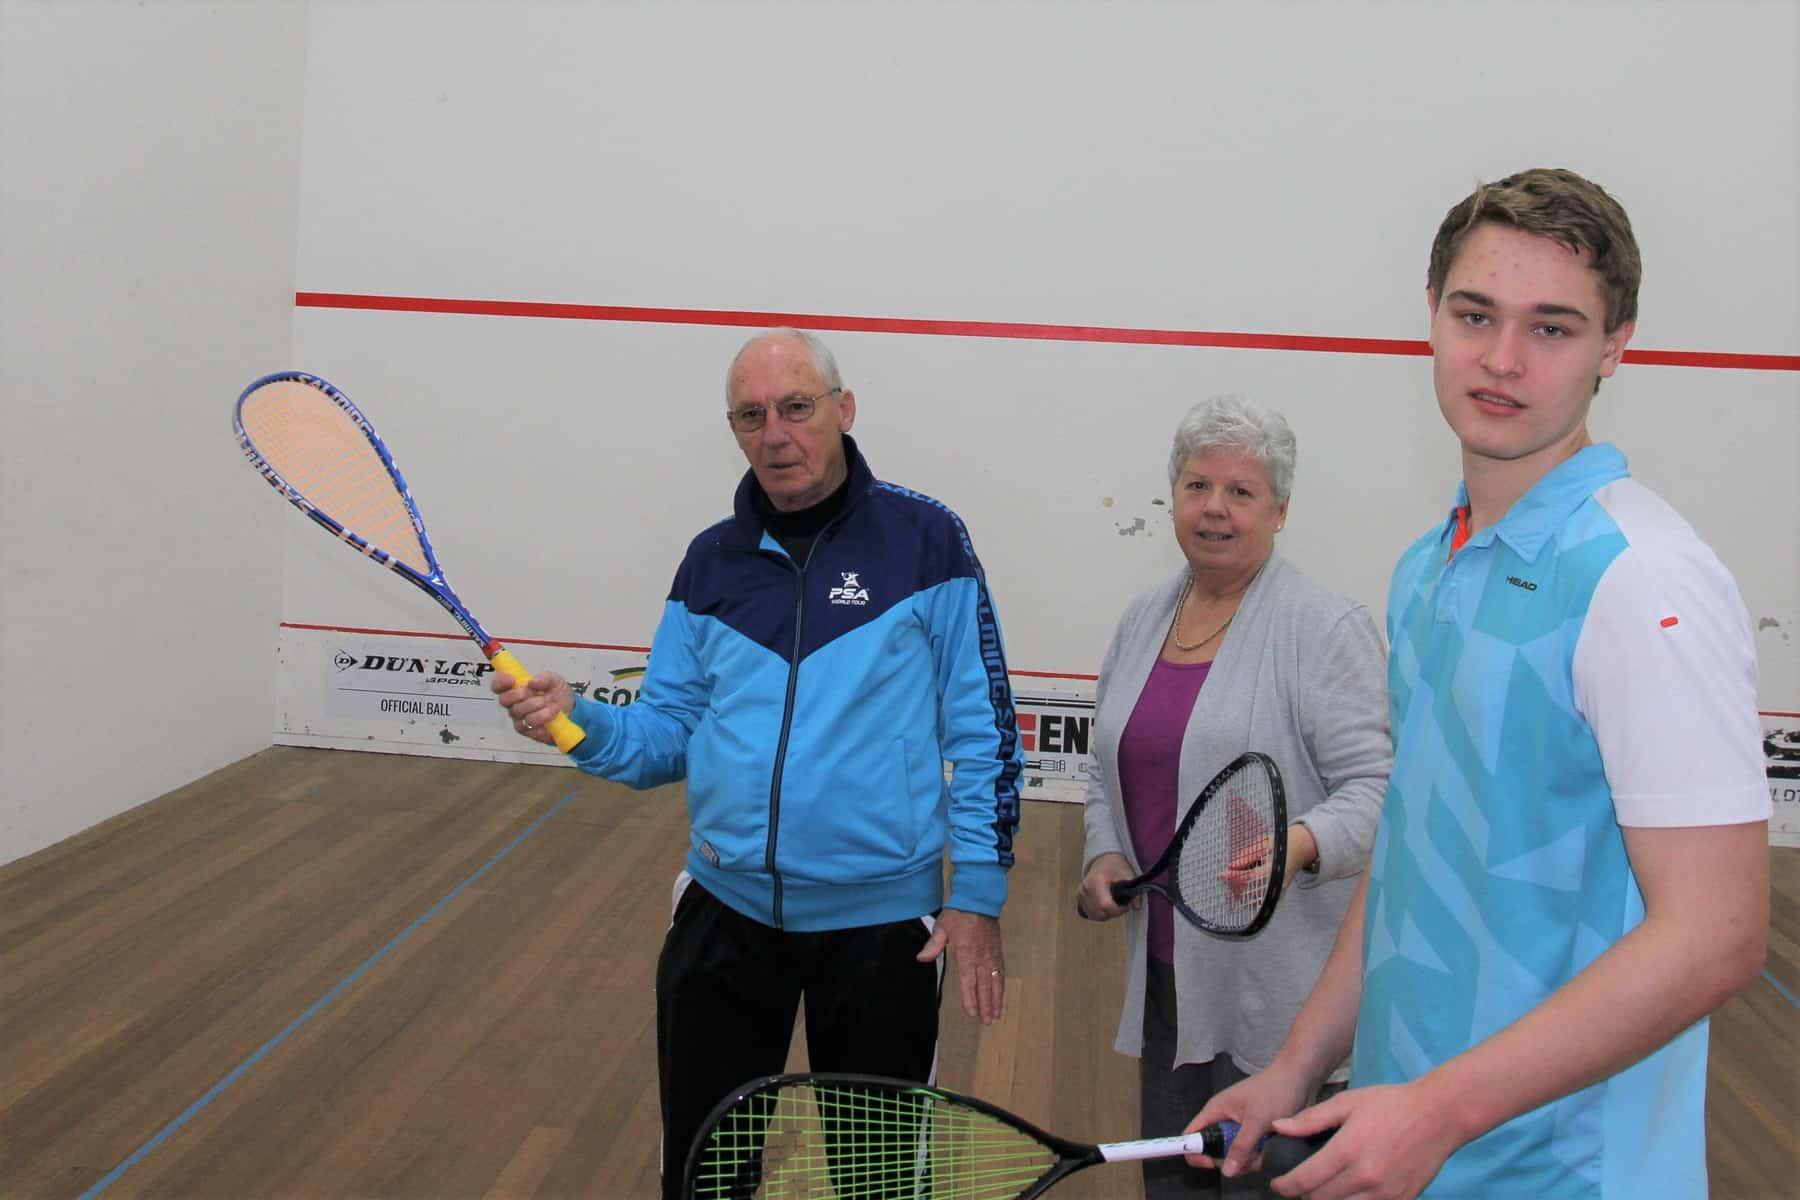 Top level men's squash coming to Devonport